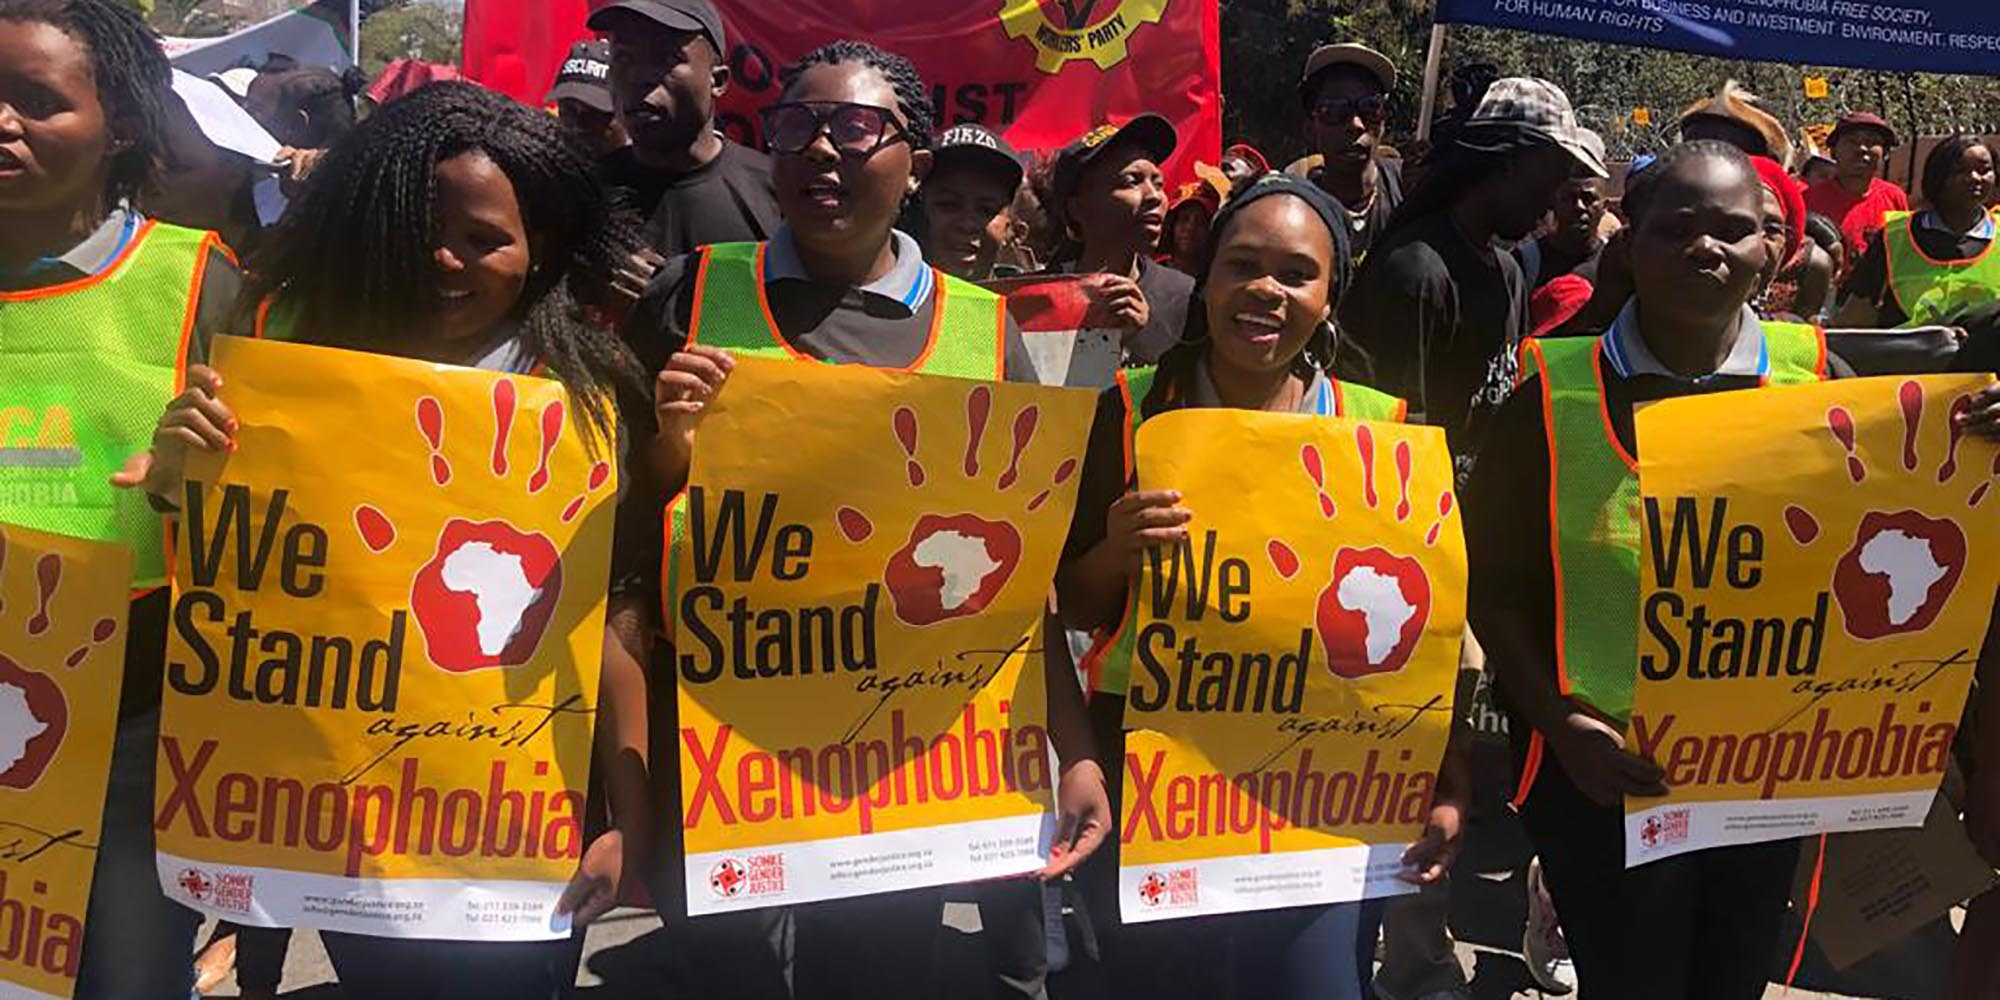 Xenophobia aangevuur deur minister Motsoaledi se sondebok - Daily Maverick